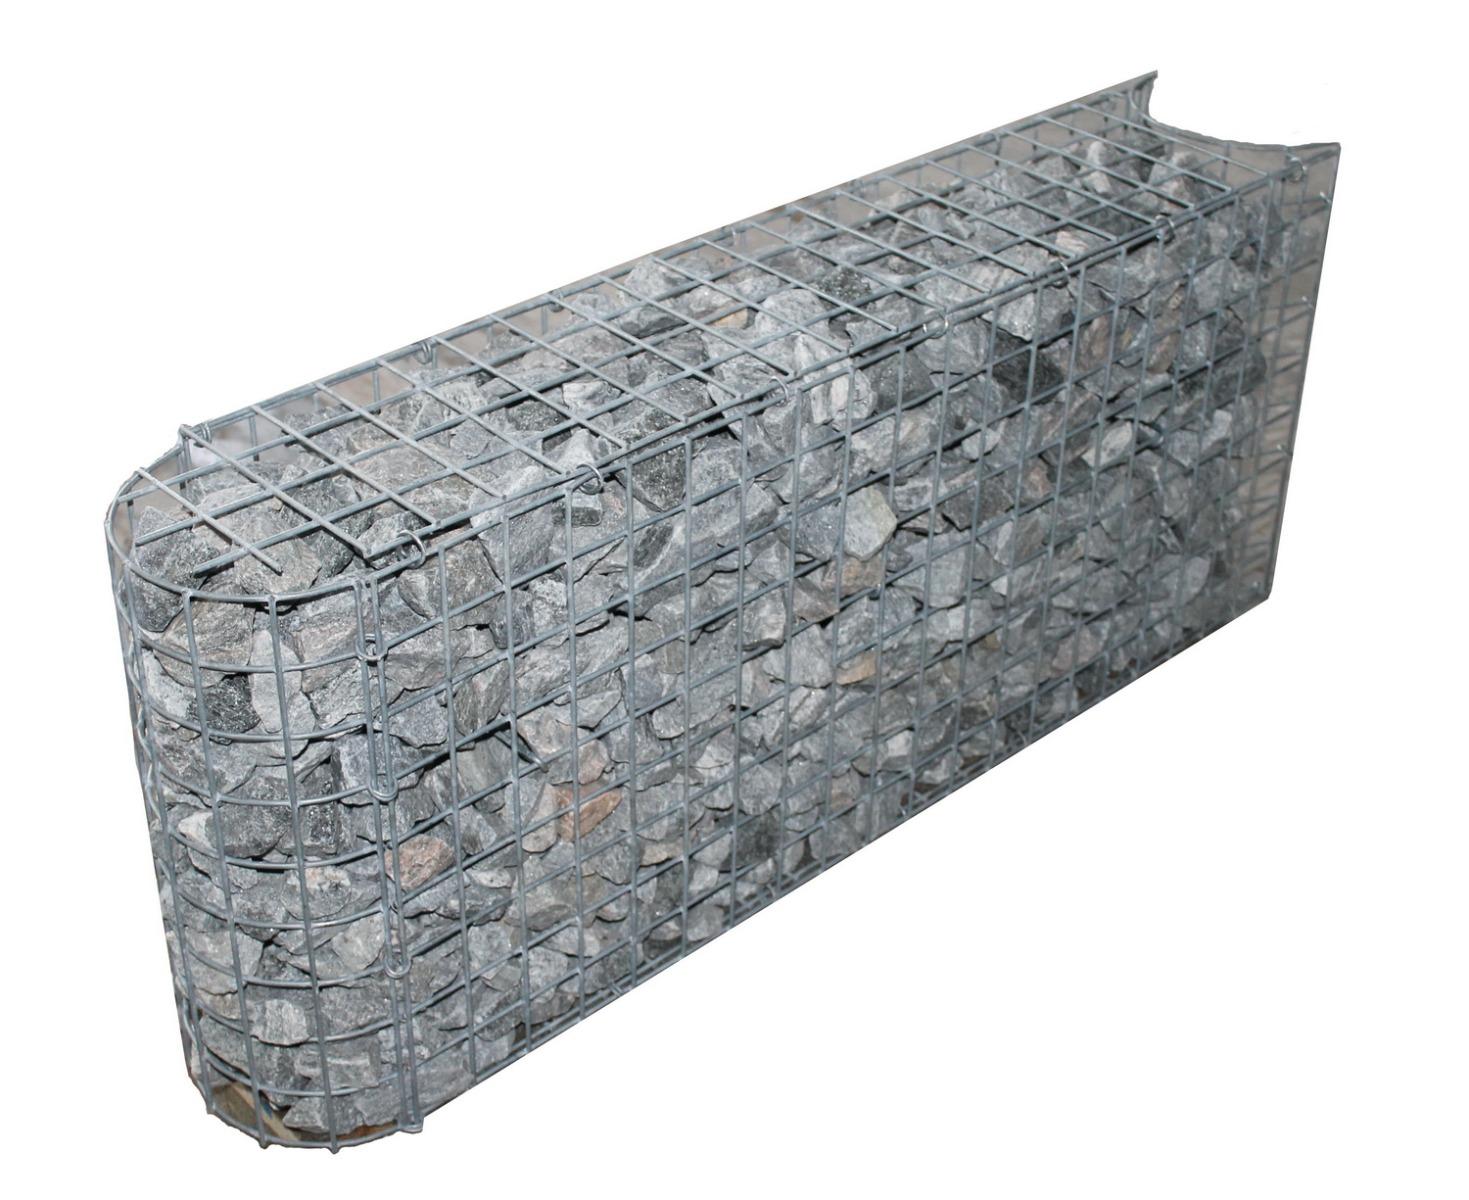 Kurven-Steinkorb Tiefe 0,22m